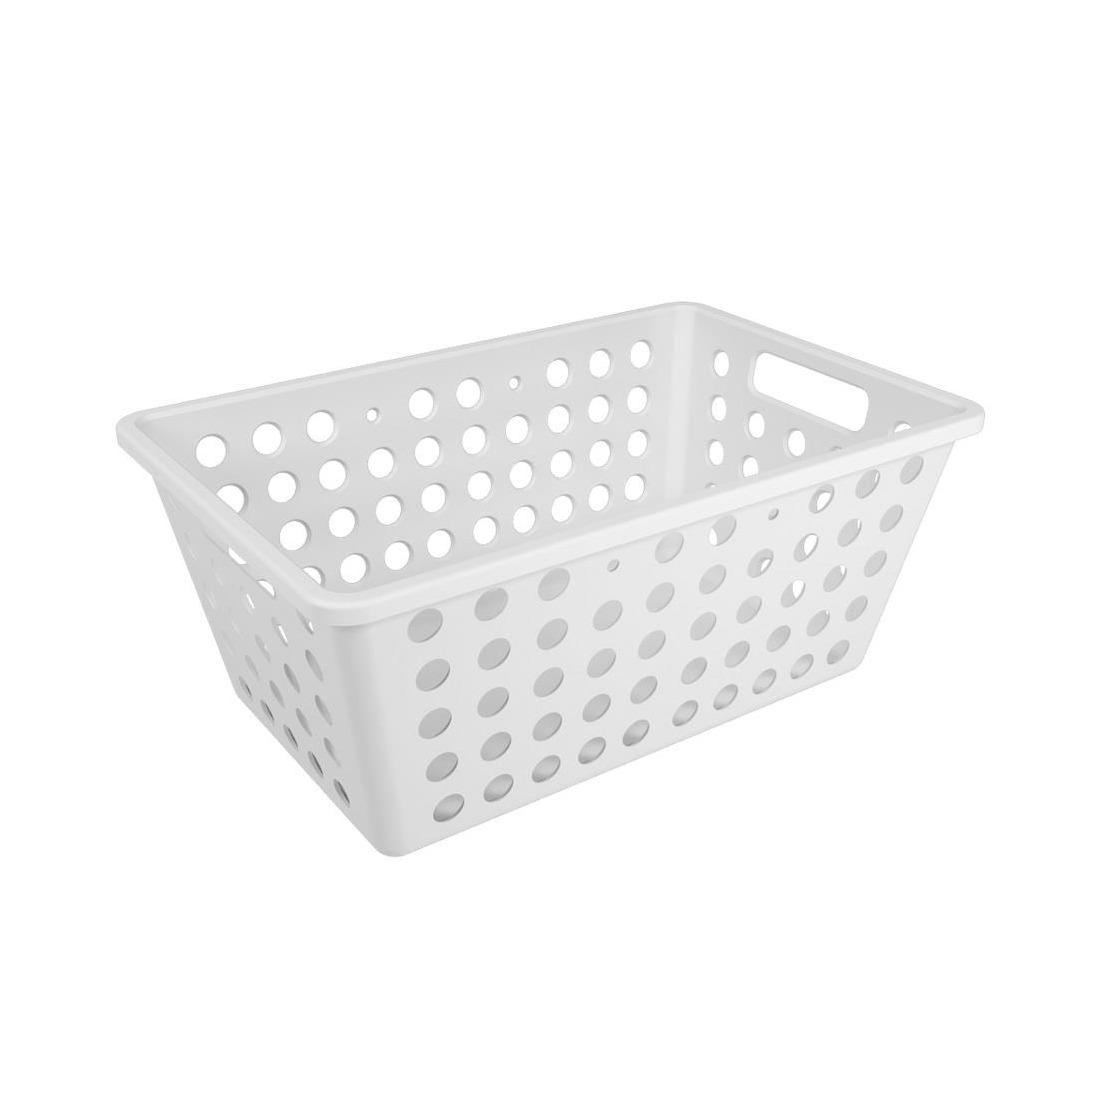 Cesta Organizadora de Plastico 28x19cm Retangular Branca - Coza